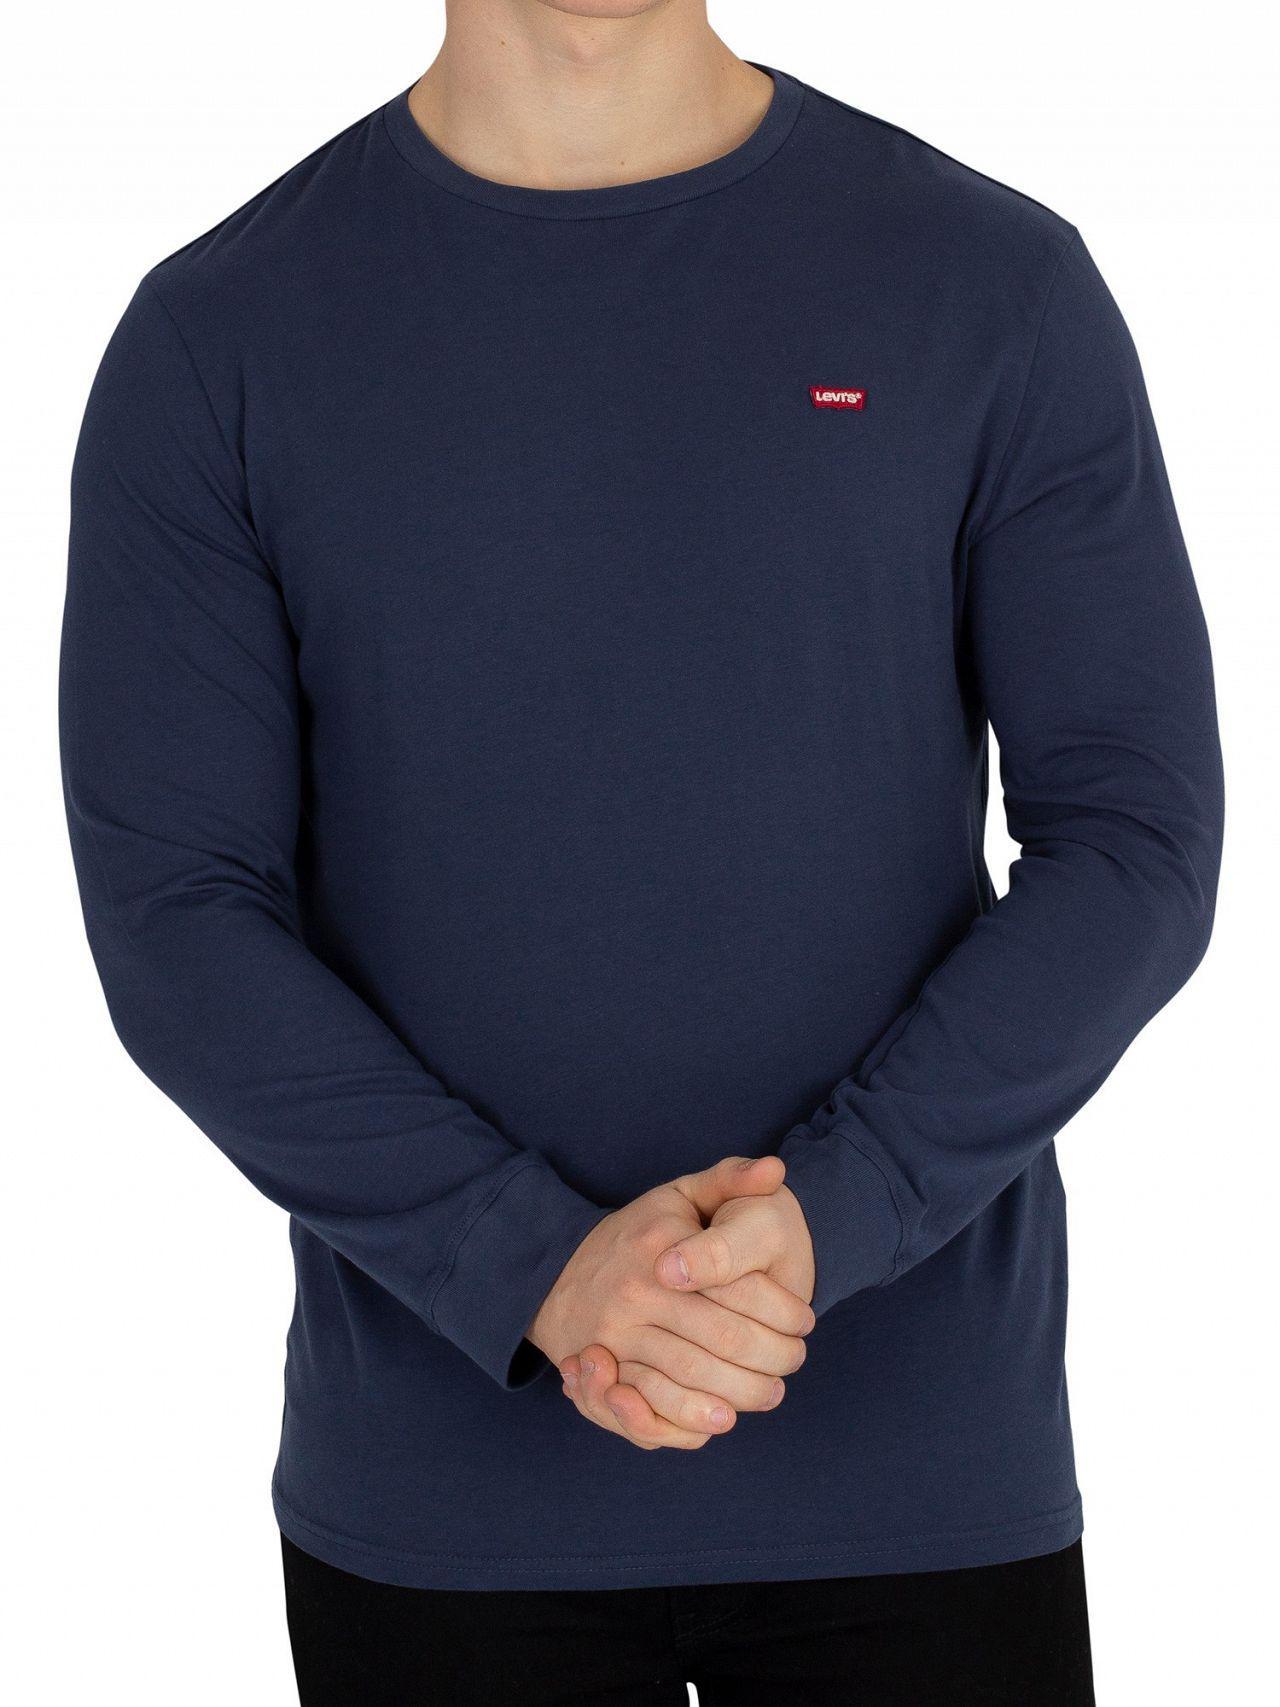 f1a9937d342f Lyst - Levi's Navy Longsleeved Original T-shirt in Blue for Men